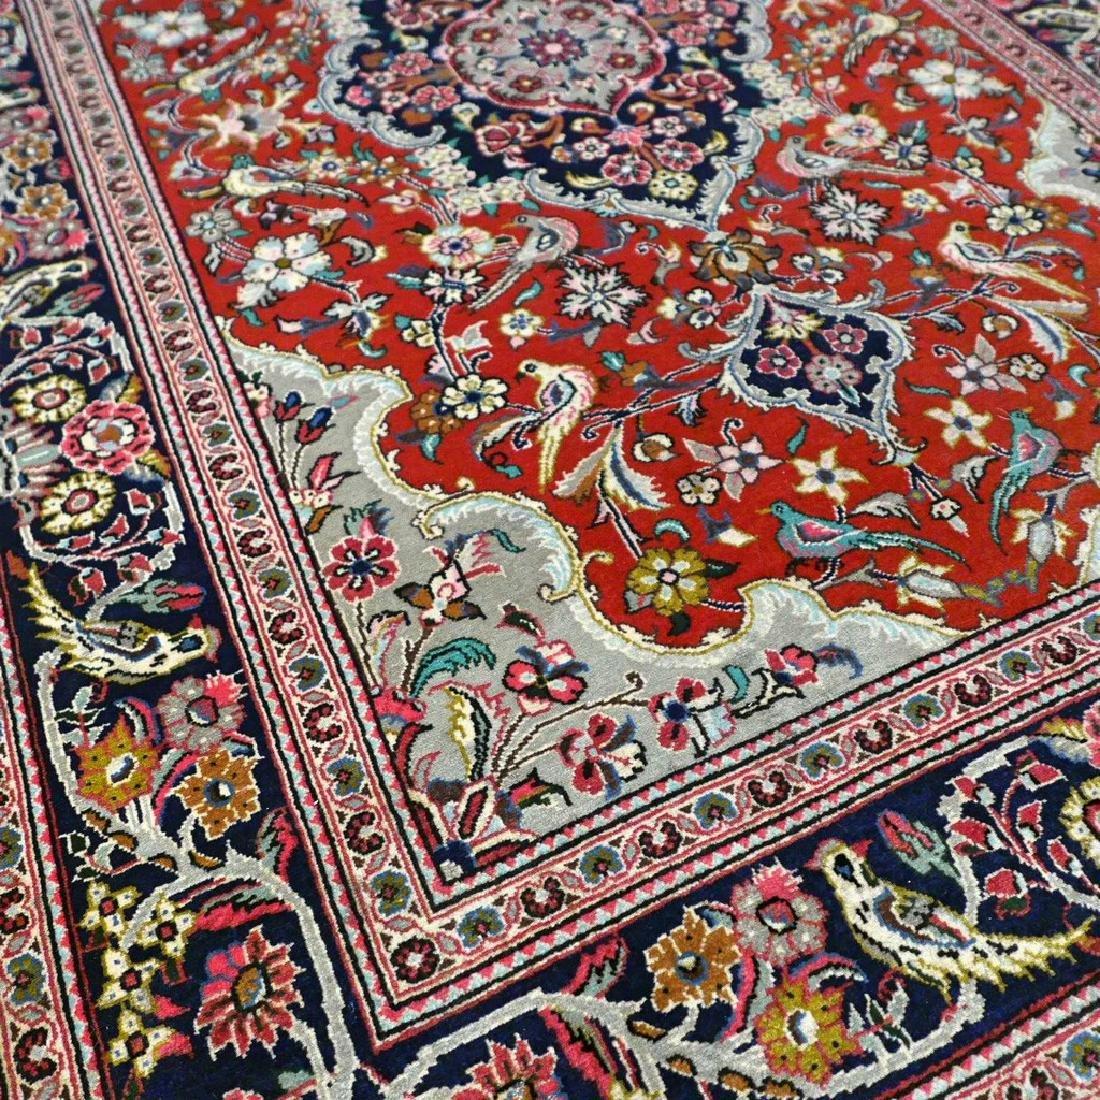 Qum Kork Wool on Cotton Rug 5.4x3.6 - 5